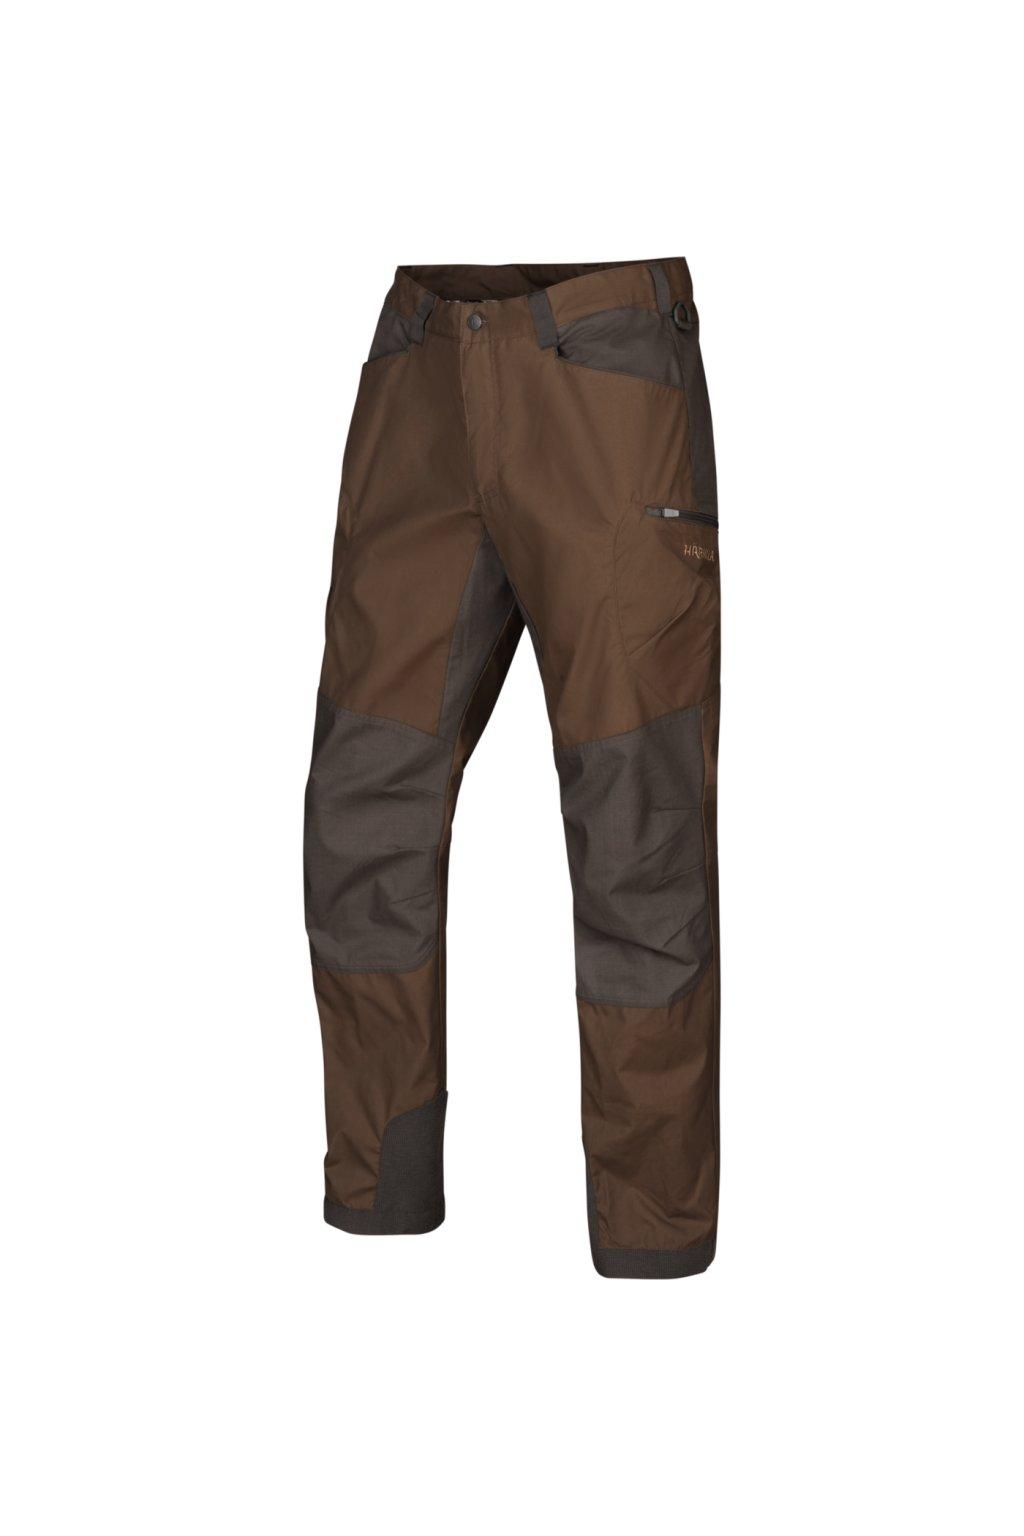 HÄRKILA - Hermod kalhoty pánské  State brown/Shadow grey